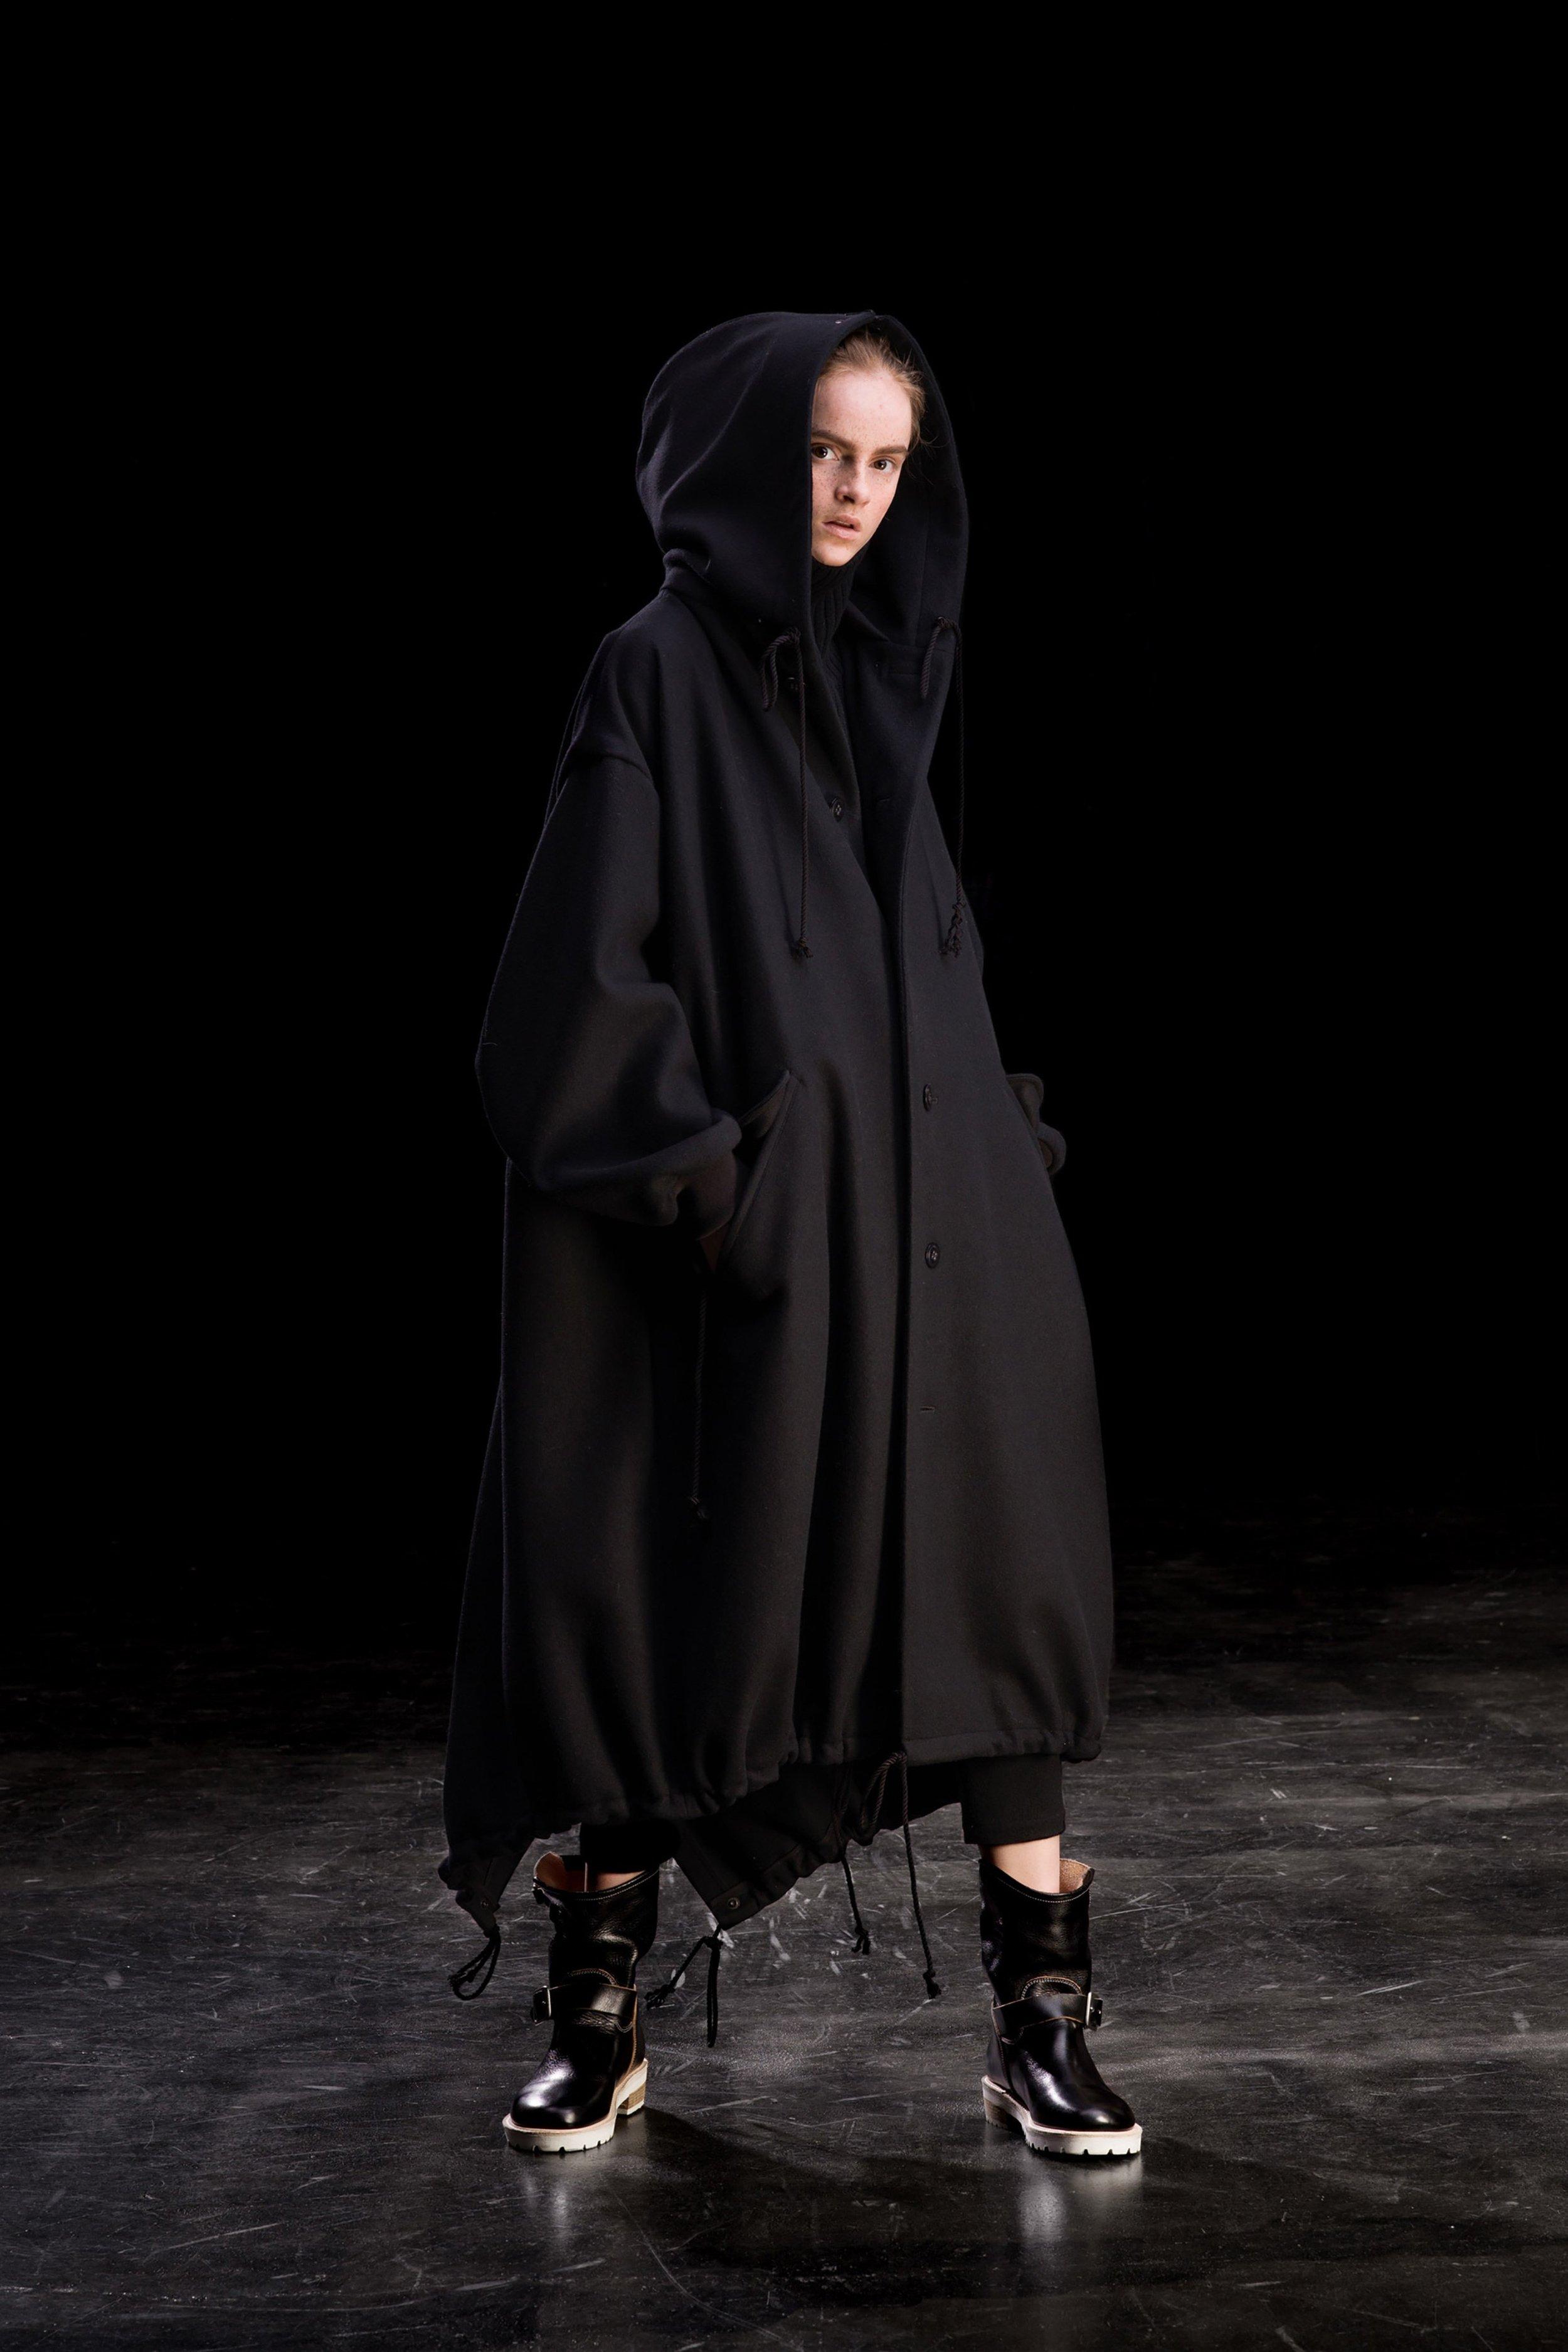 00032-Ys-Yohji-Yamamoto-FALL-19-Ready-To-Wear.jpg